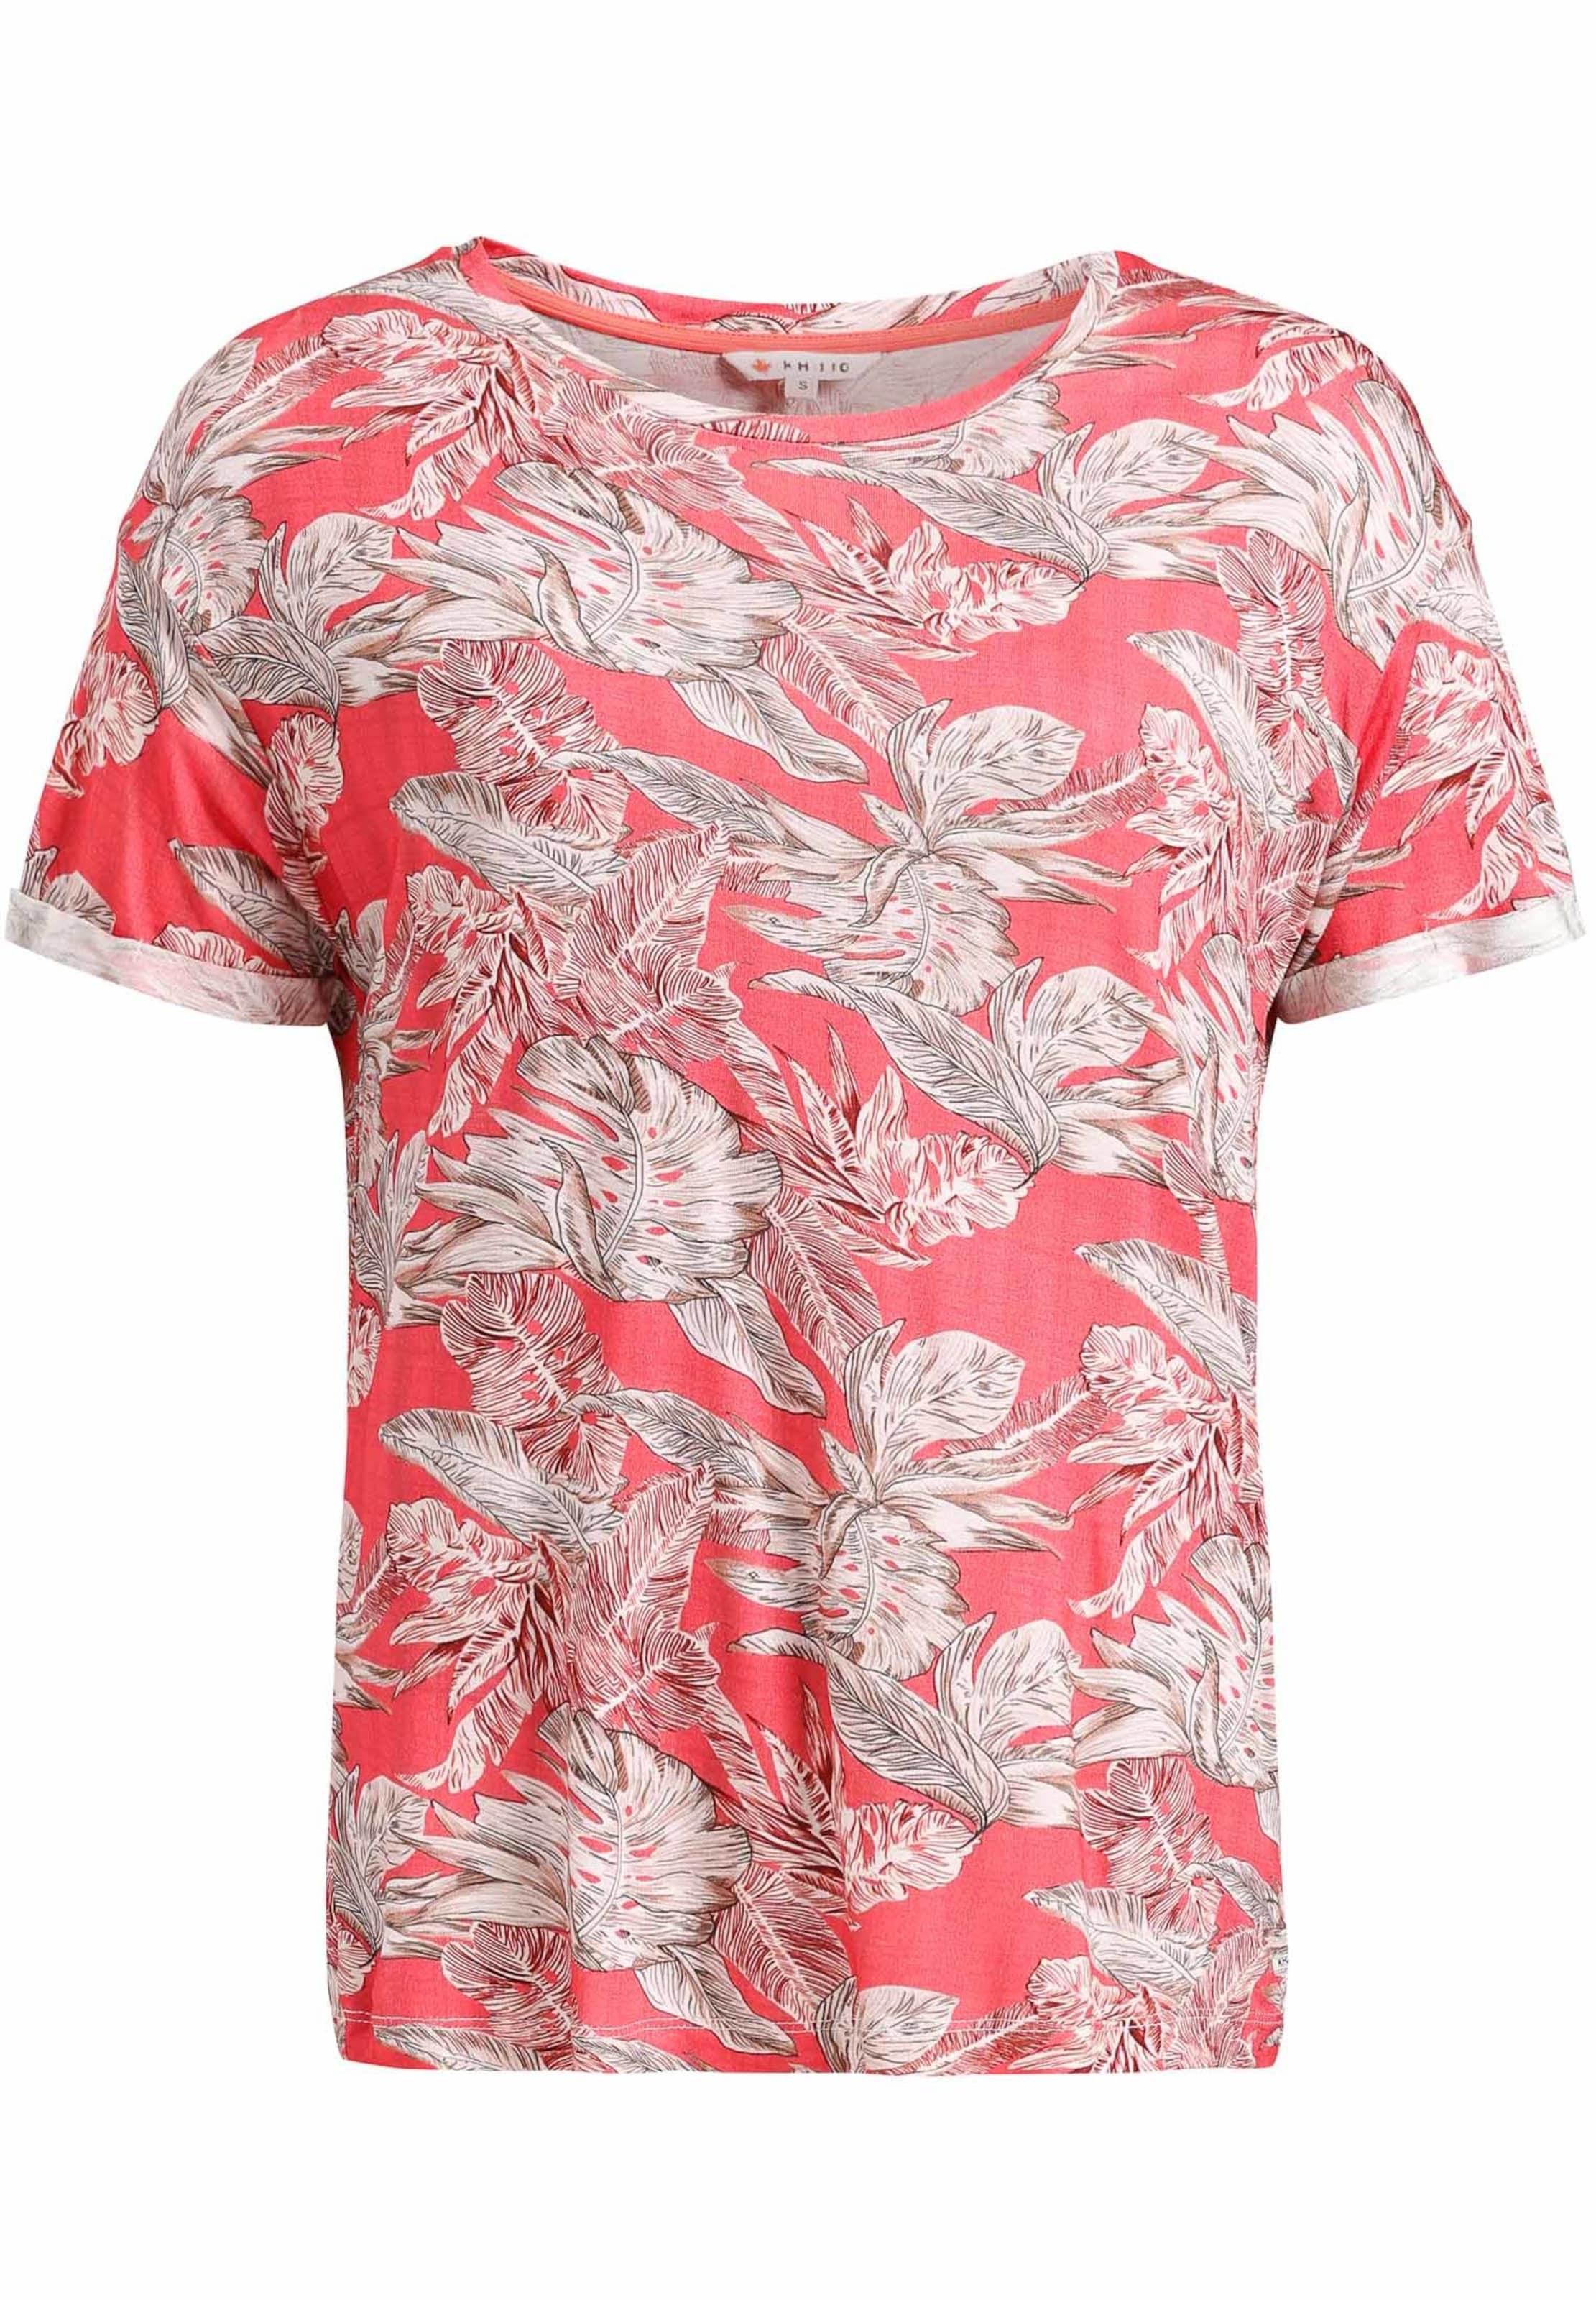 En Blanc Rouge Khujo T Clair Print' 'ornate shirt wngxFRvq4